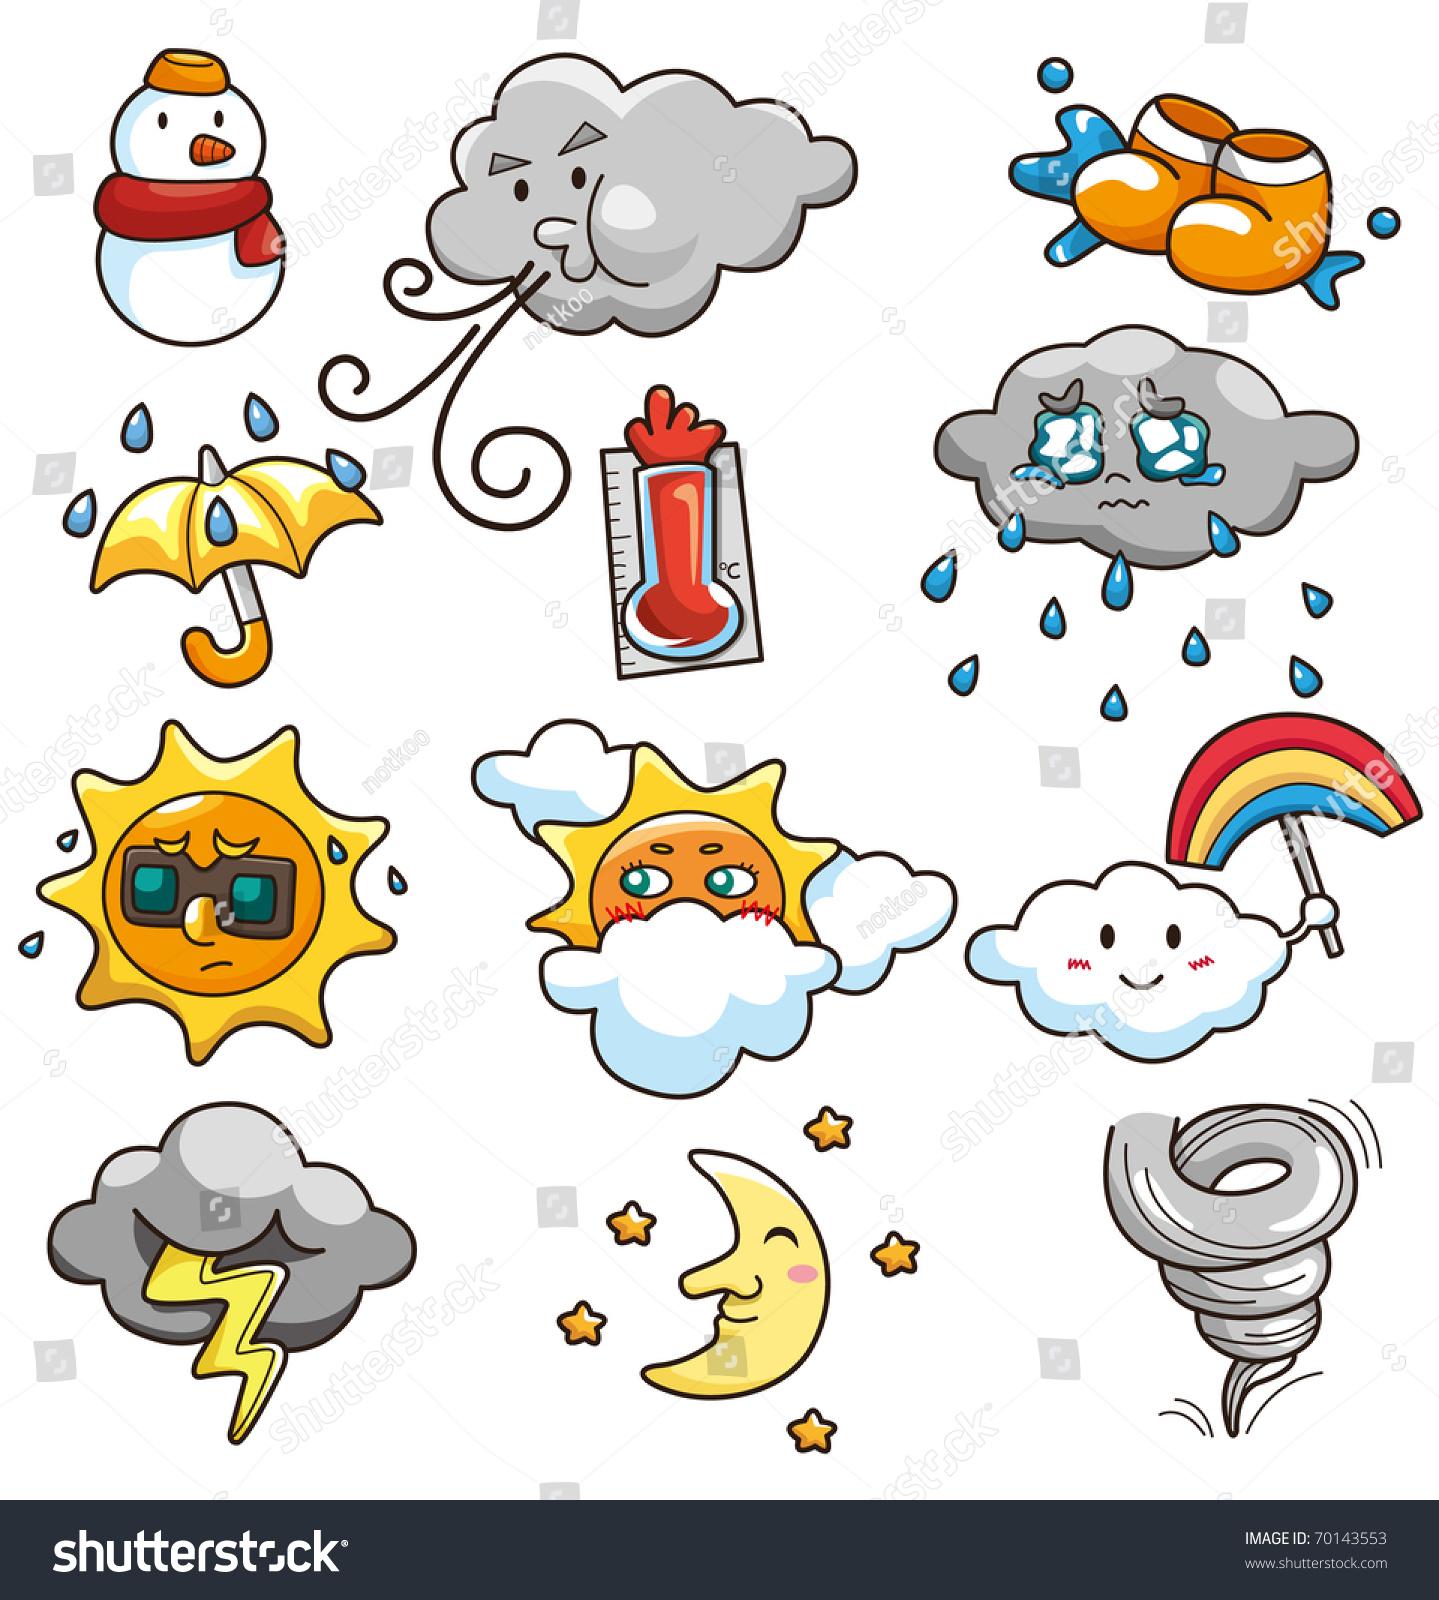 Weather - Cartoon Weather Icon